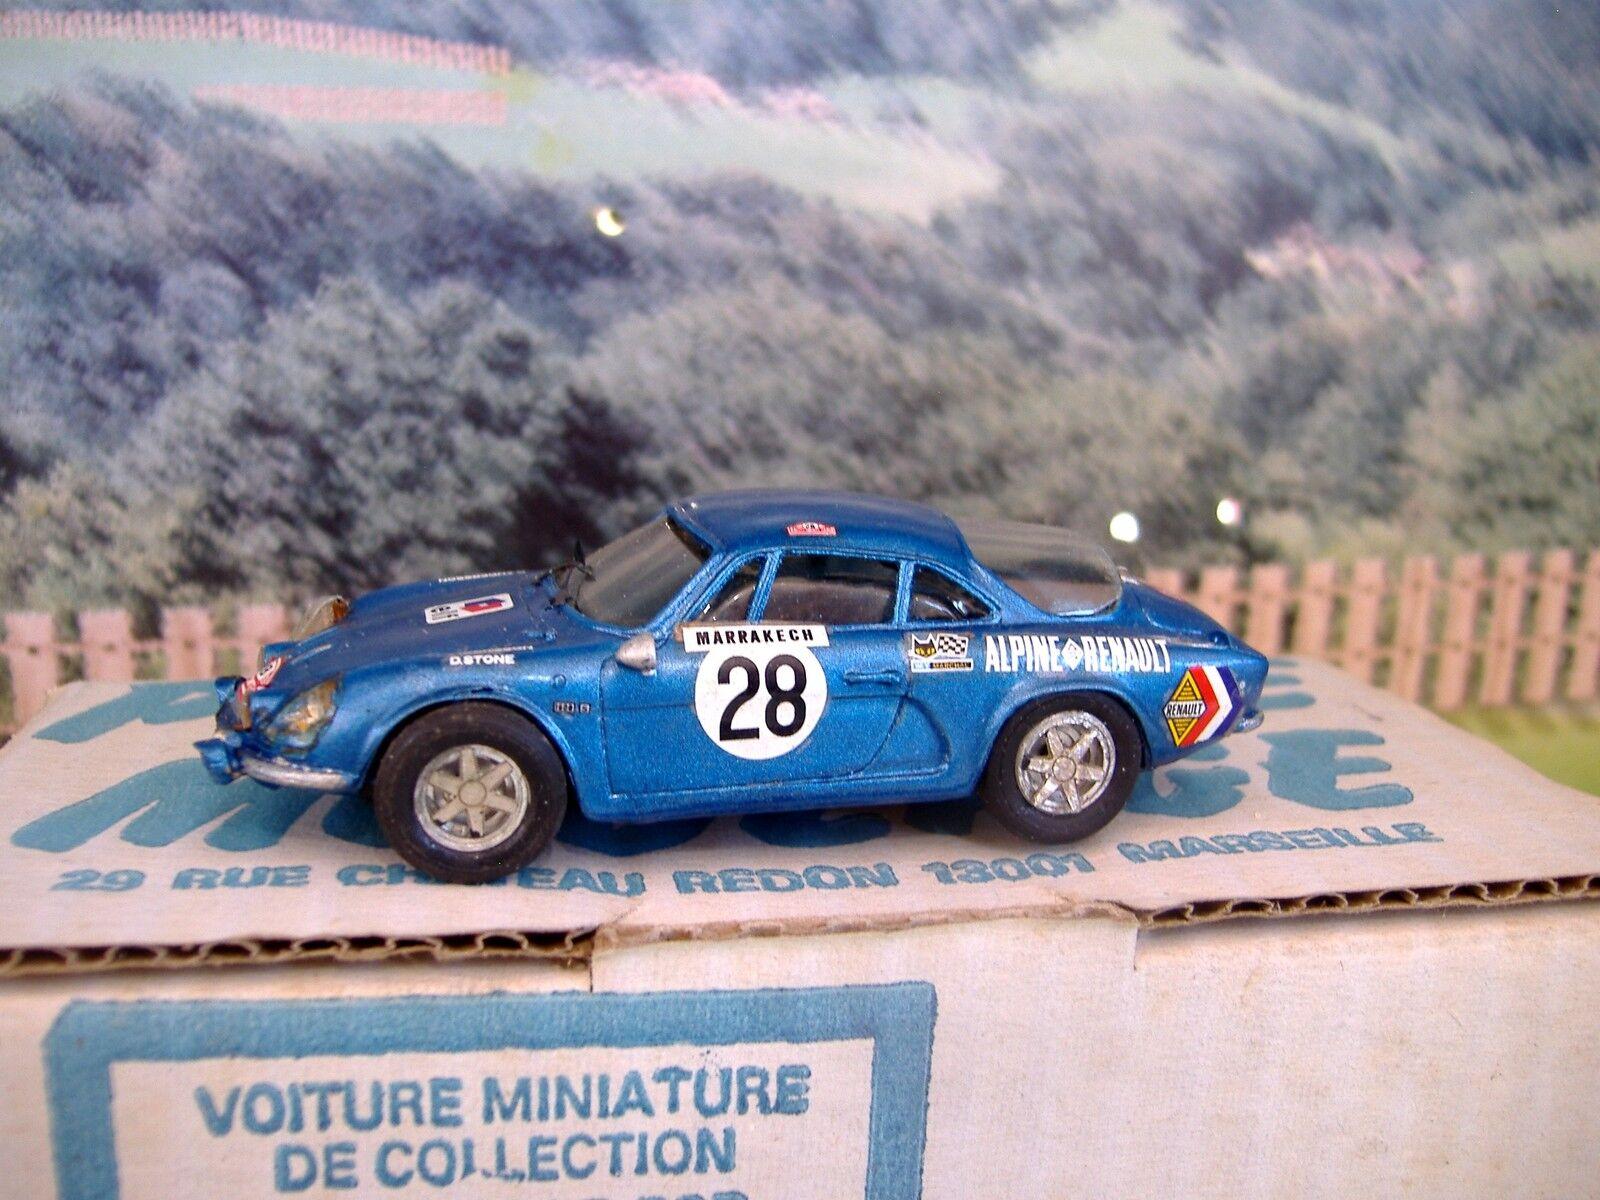 1   43 provence moulage (frankreich) im monte carlo 71 handgefertigte harz modell - auto